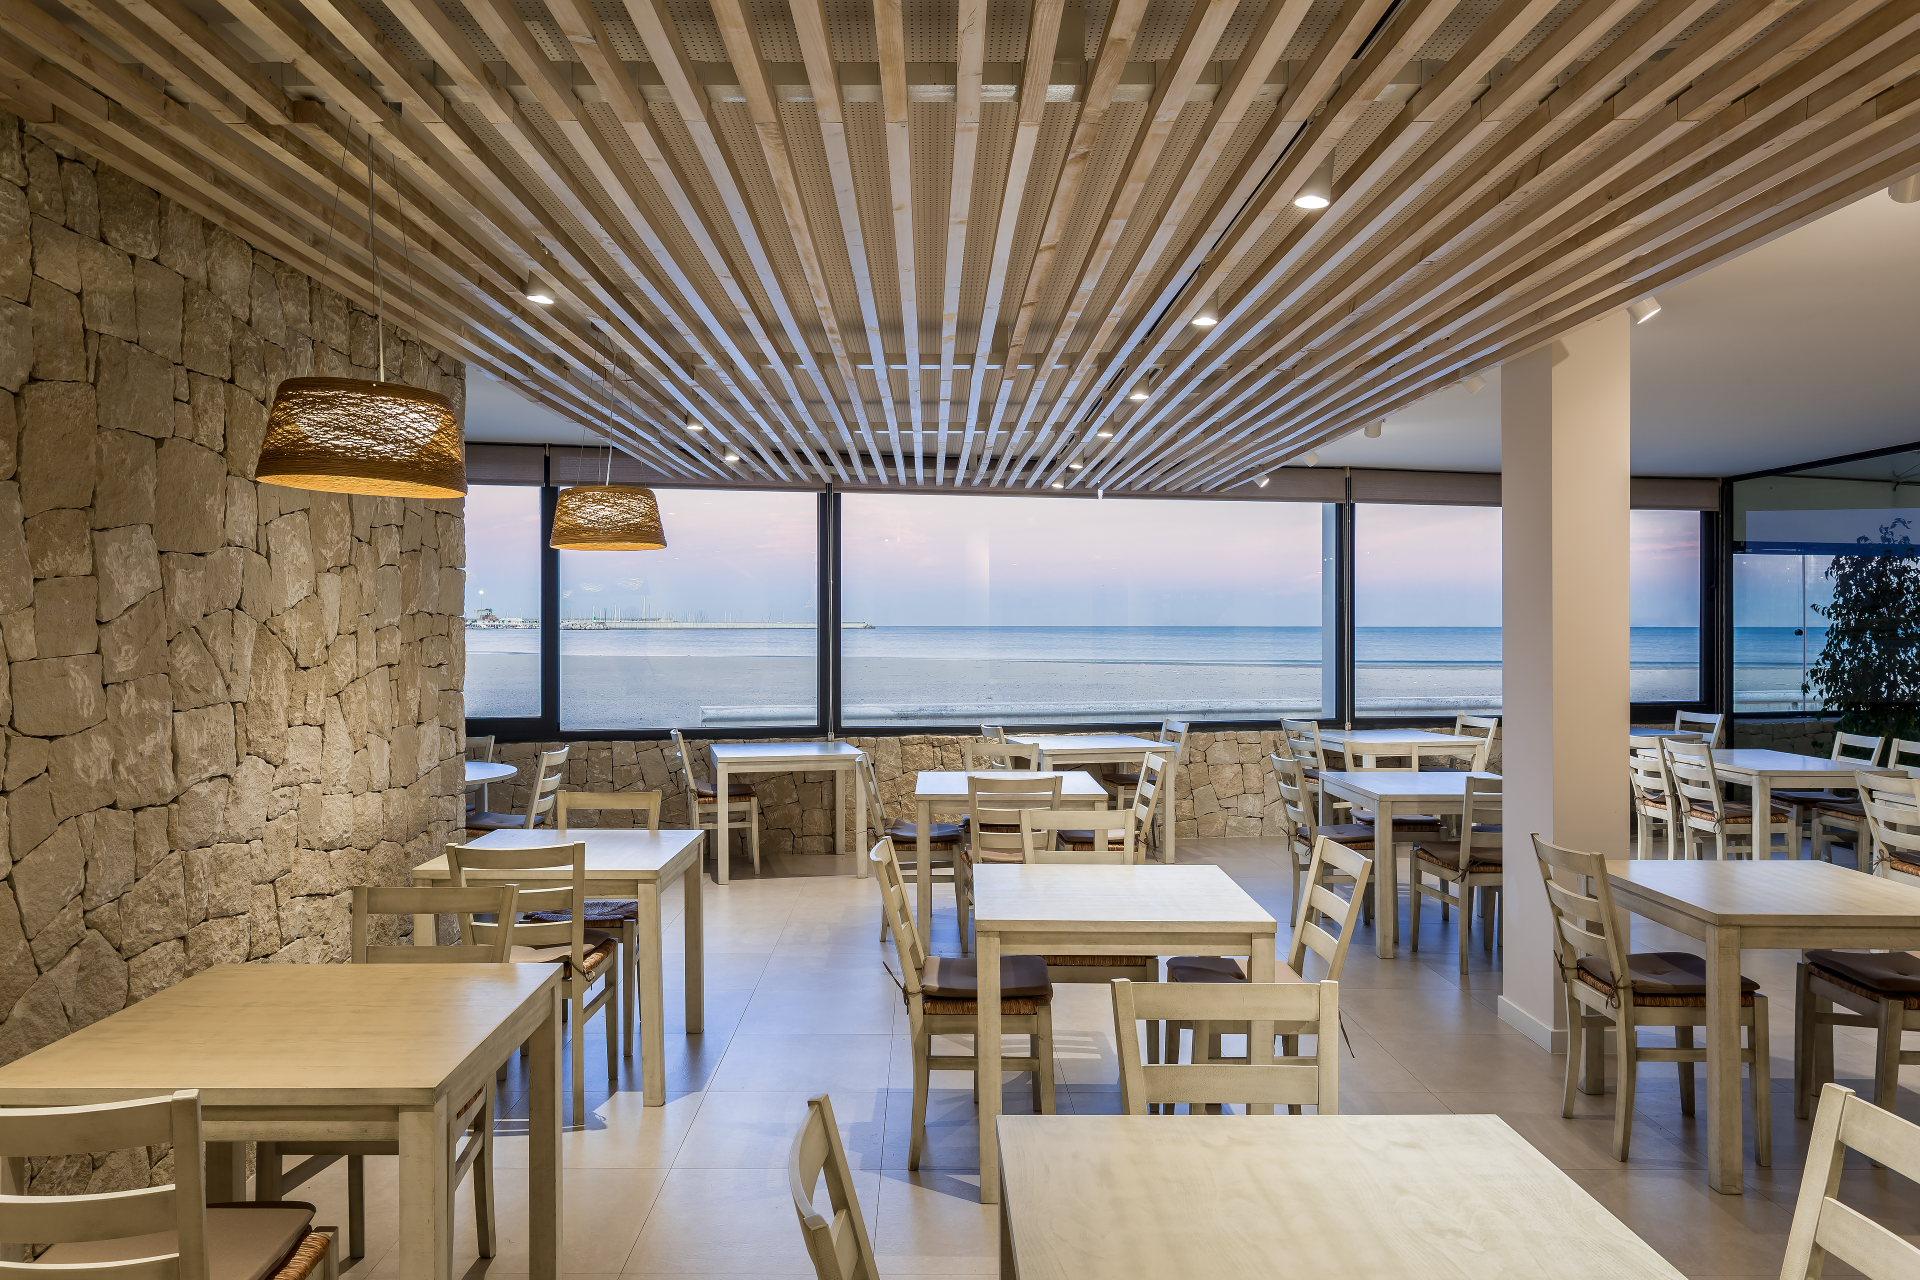 fotografia-arquitectura-valencia-german-cabo-versea-restaurante-ferrera-pinedo (25)